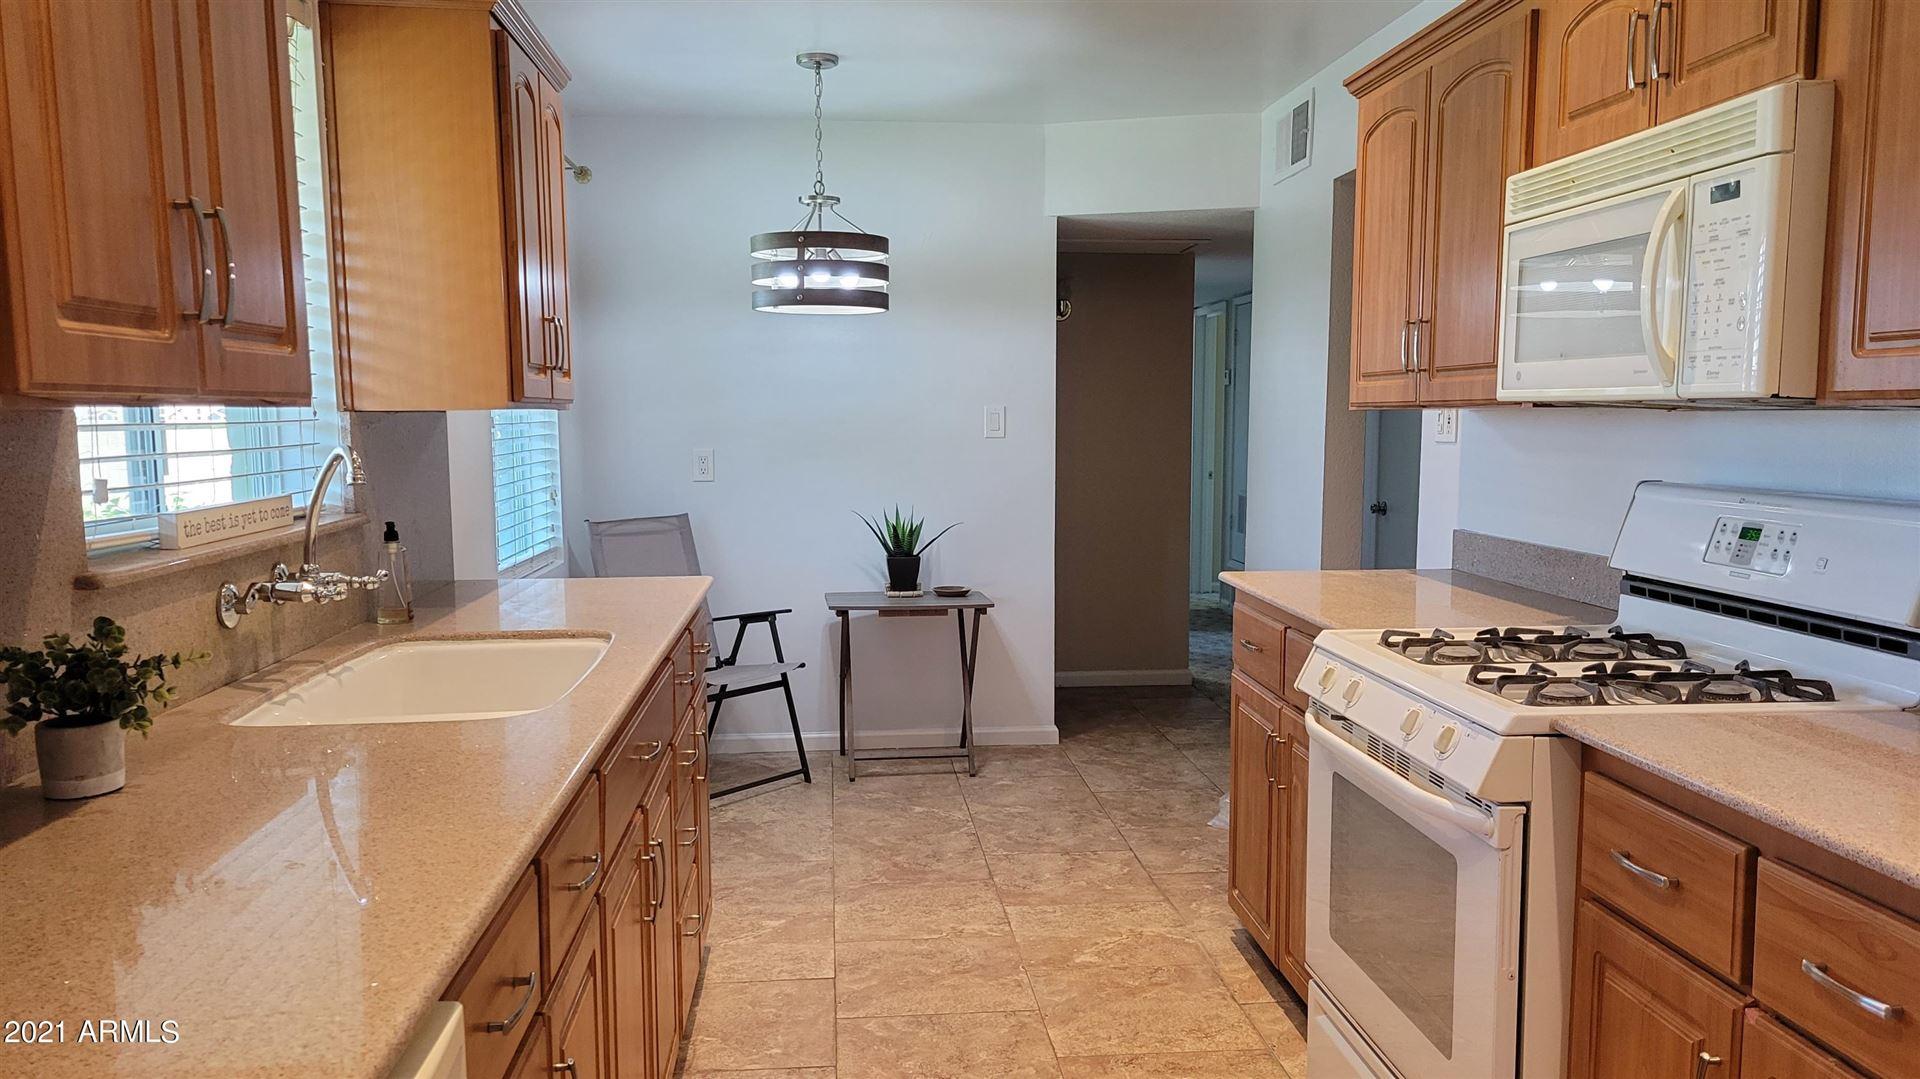 Photo of 7041 E CYPRESS Street, Scottsdale, AZ 85257 (MLS # 6272422)